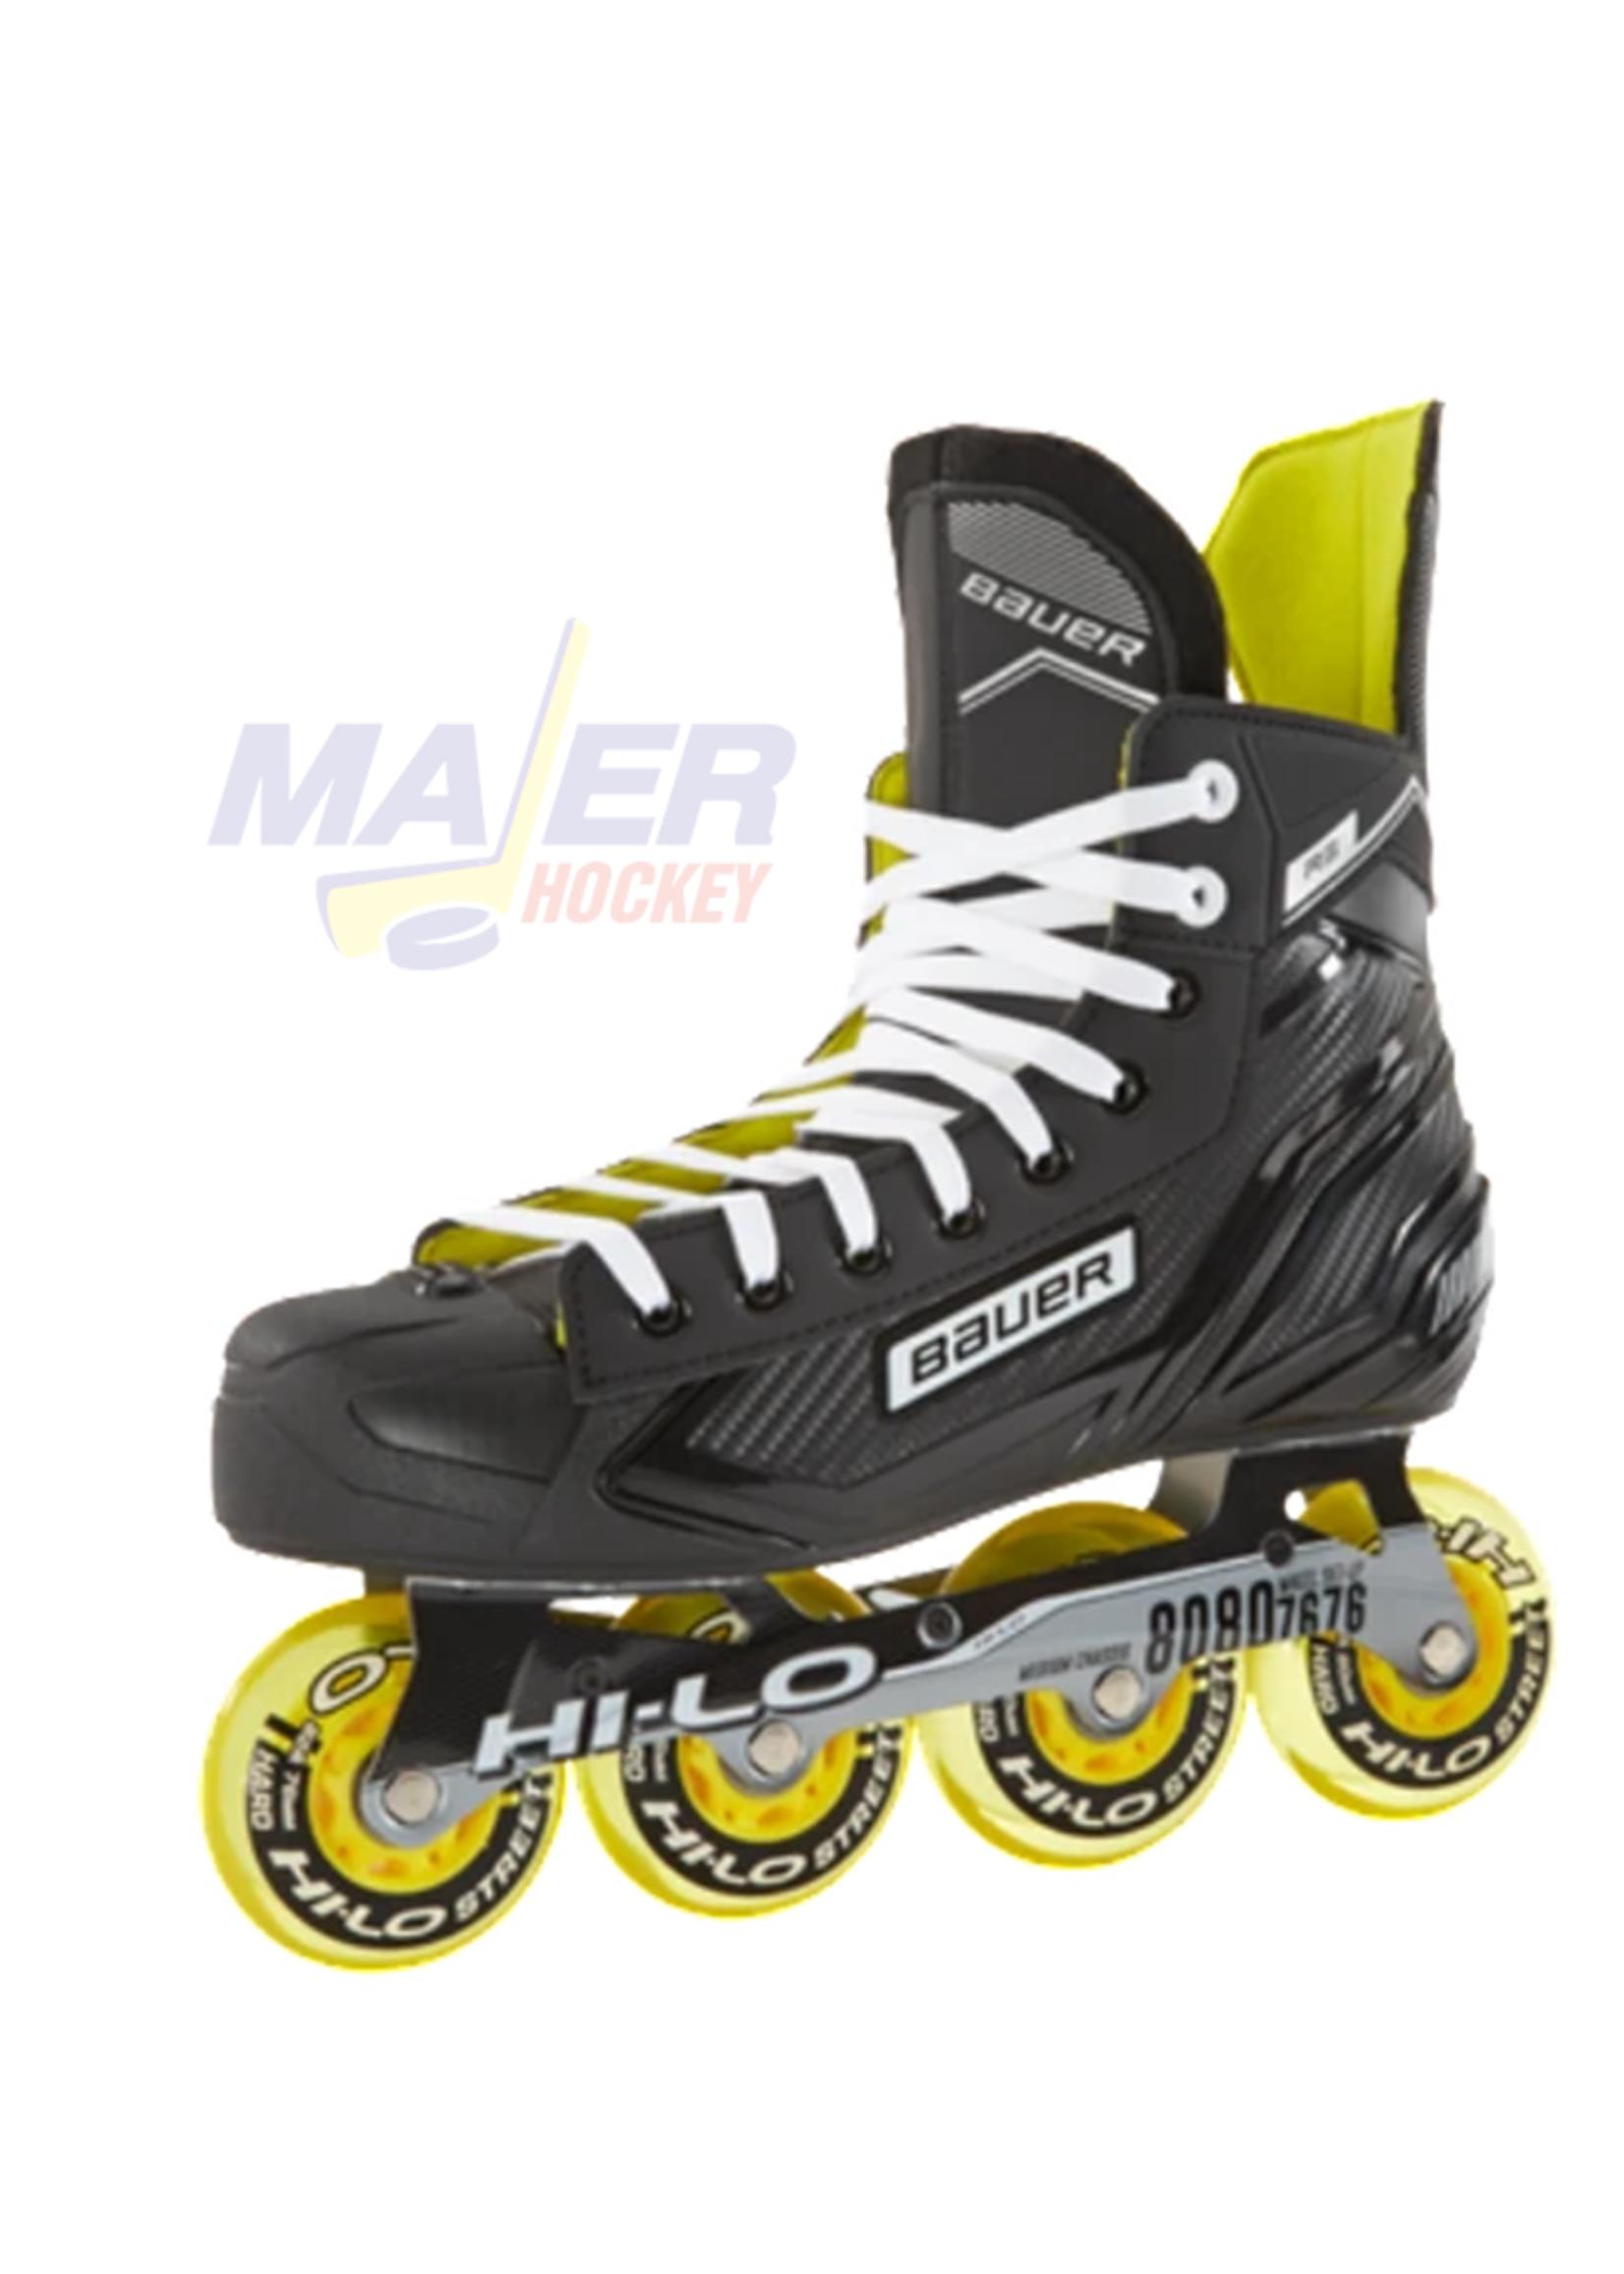 Bauer RH RS Sr Inline Hockey Skates